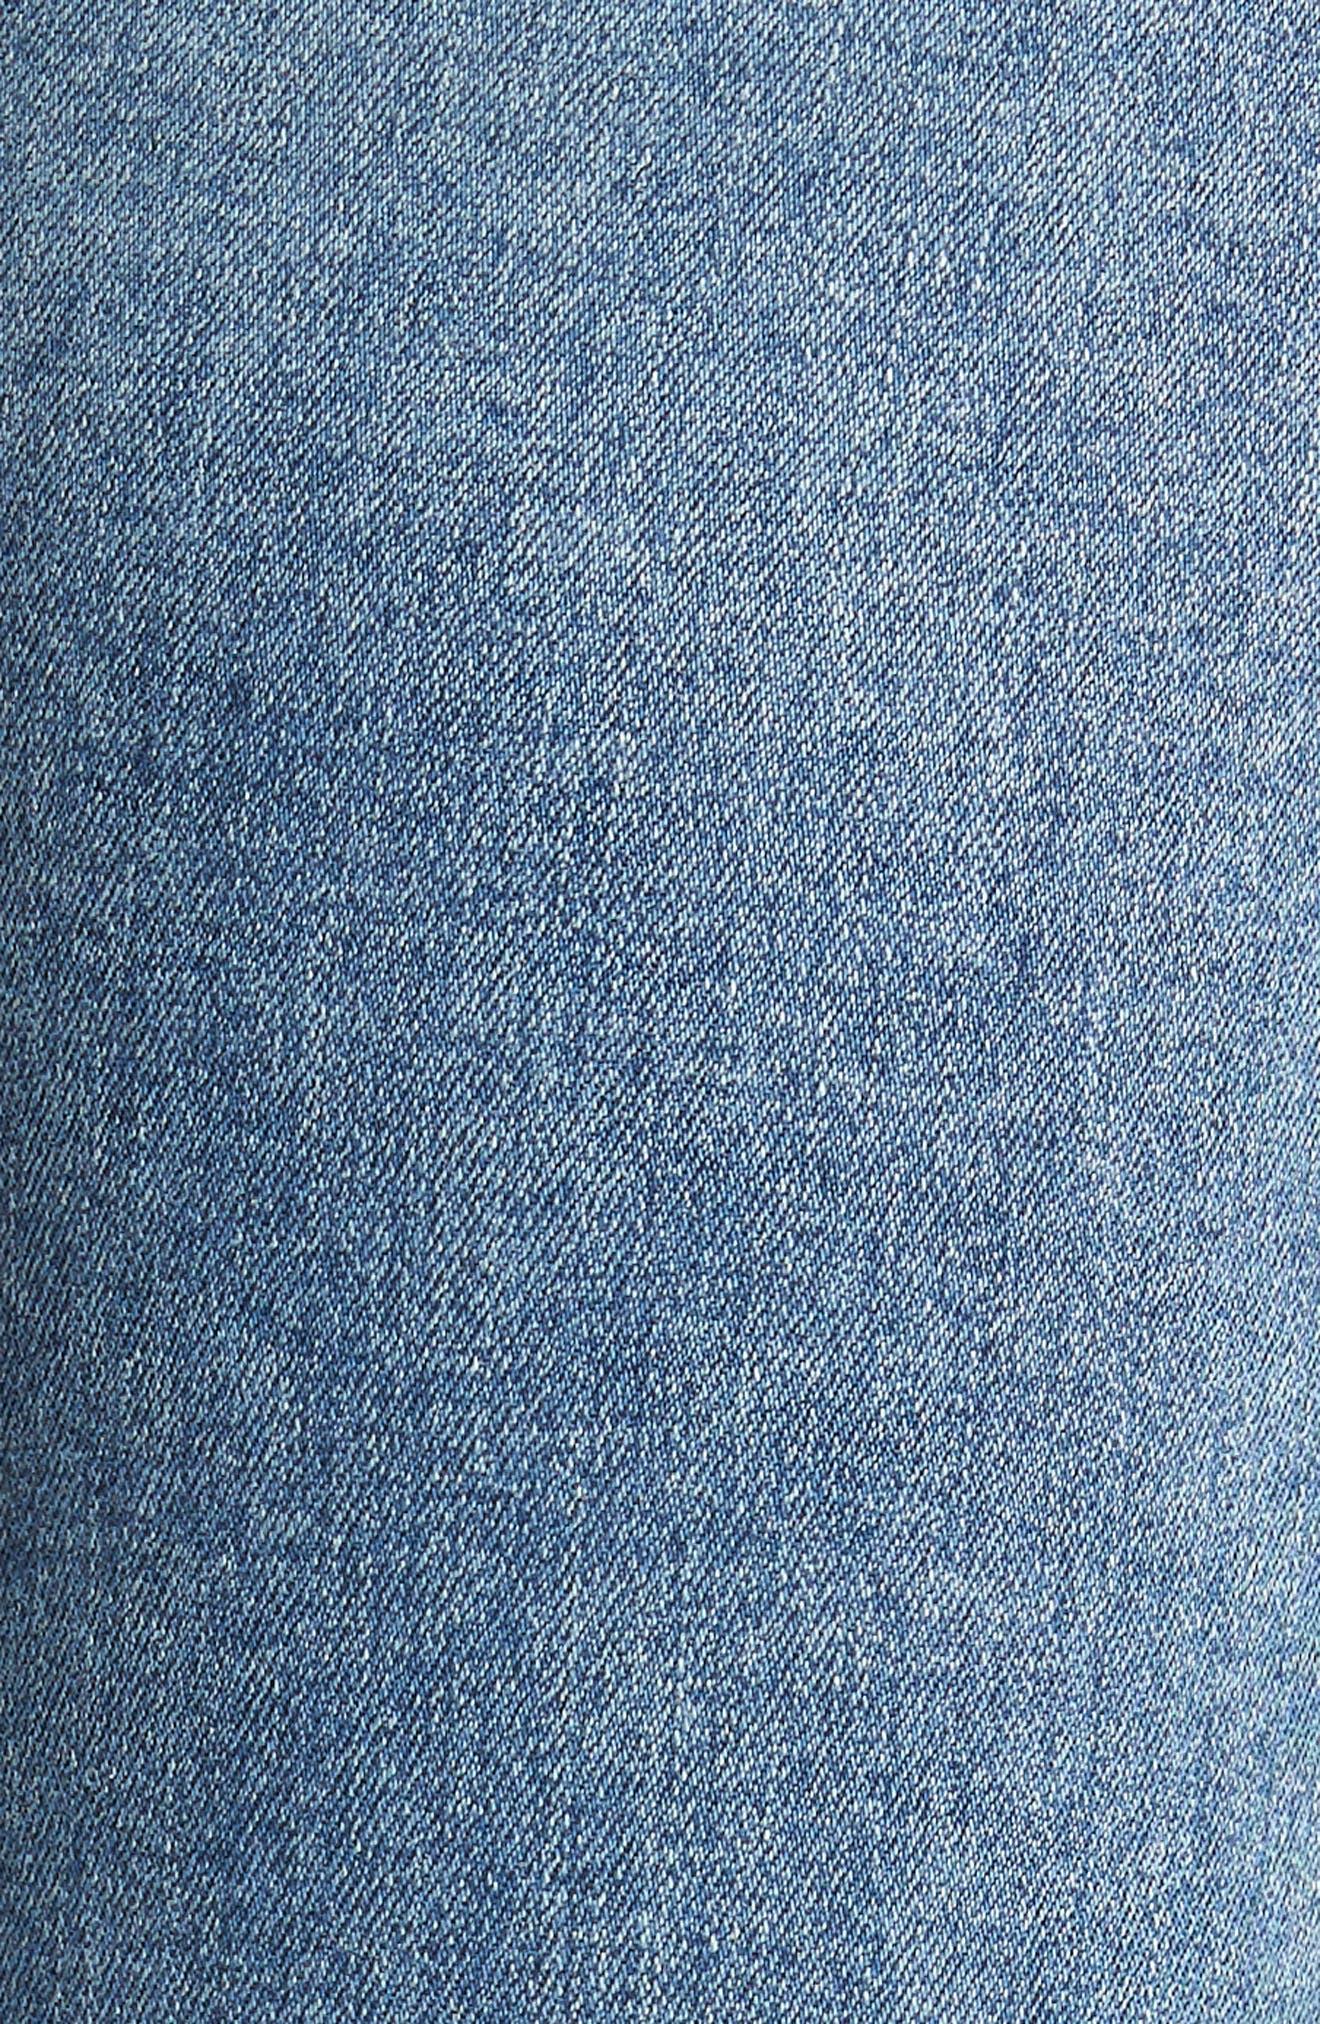 Cara Ankle Cigarette Jeans,                             Alternate thumbnail 6, color,                             457